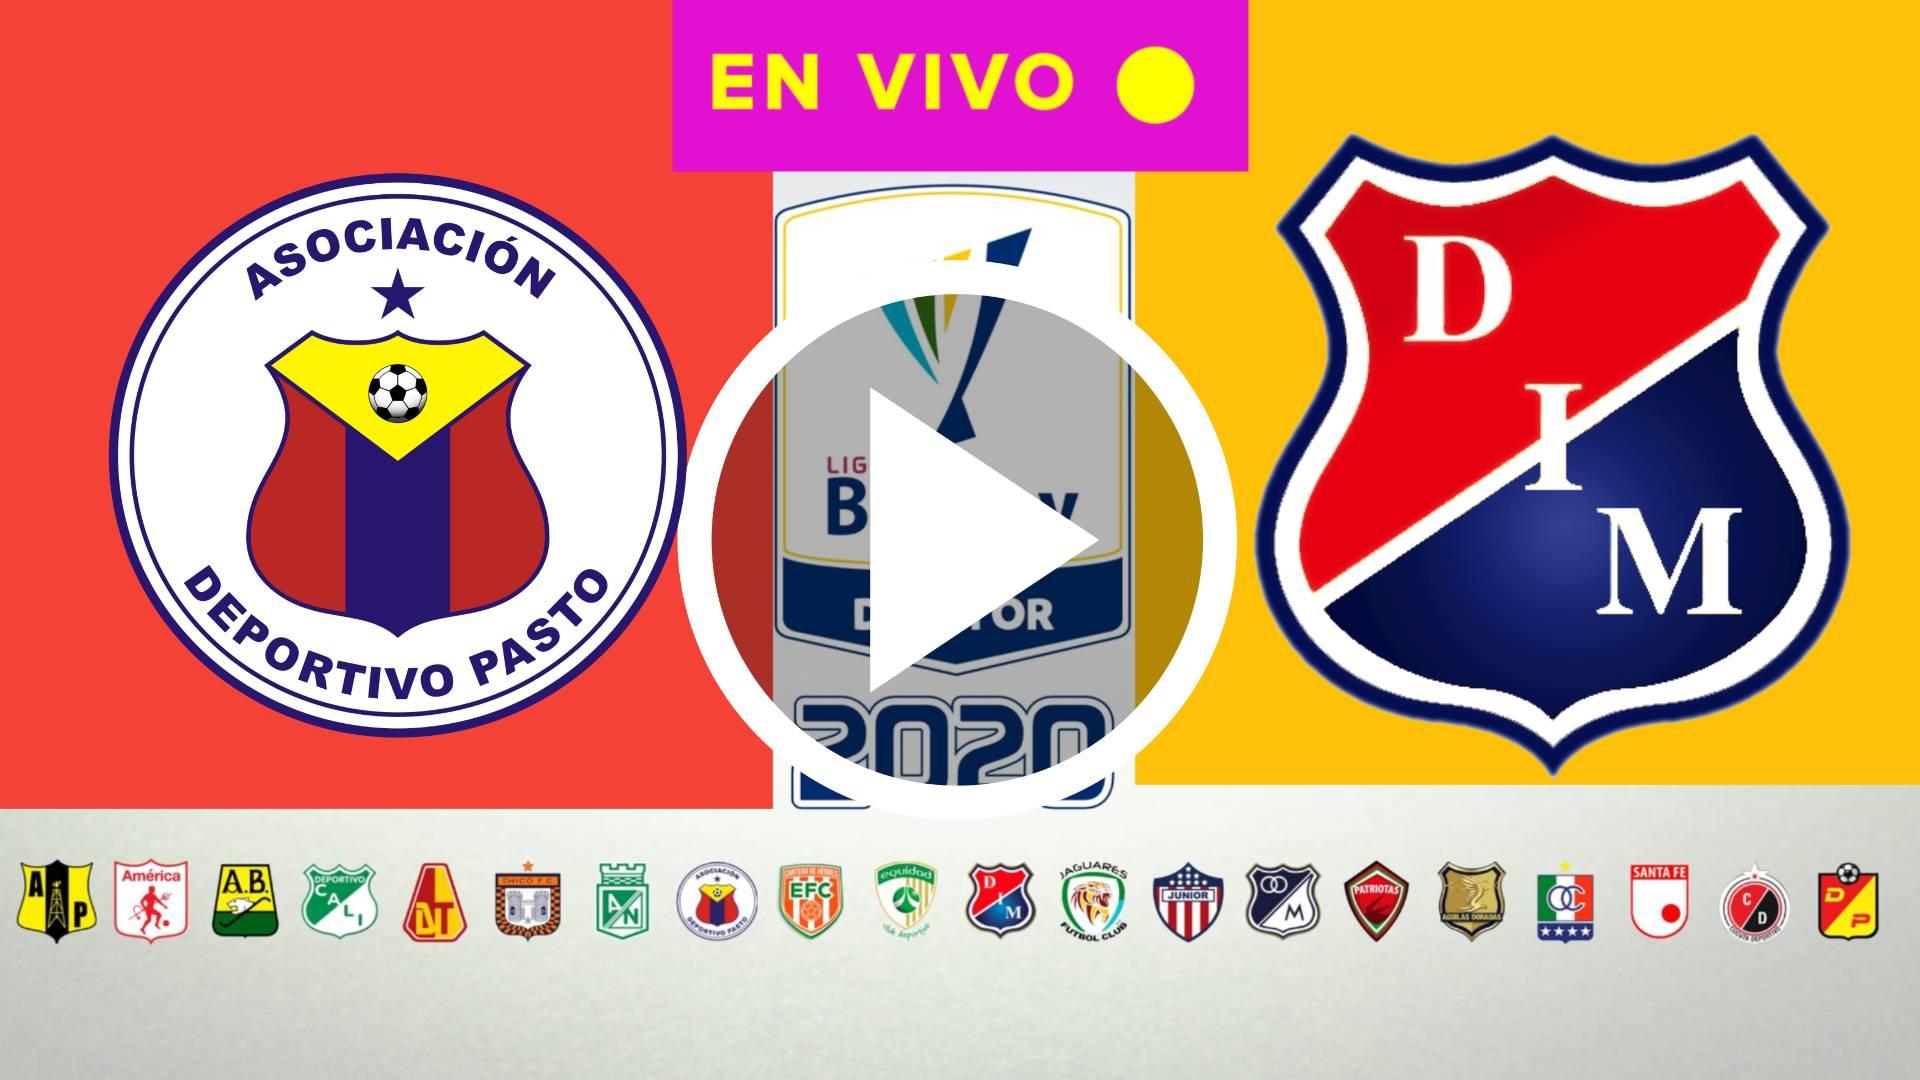 HOY AQUI LIGA BETPLAY 2020 Deportivo Pasto - Medellín EN DIRECTO GRATIS HOY